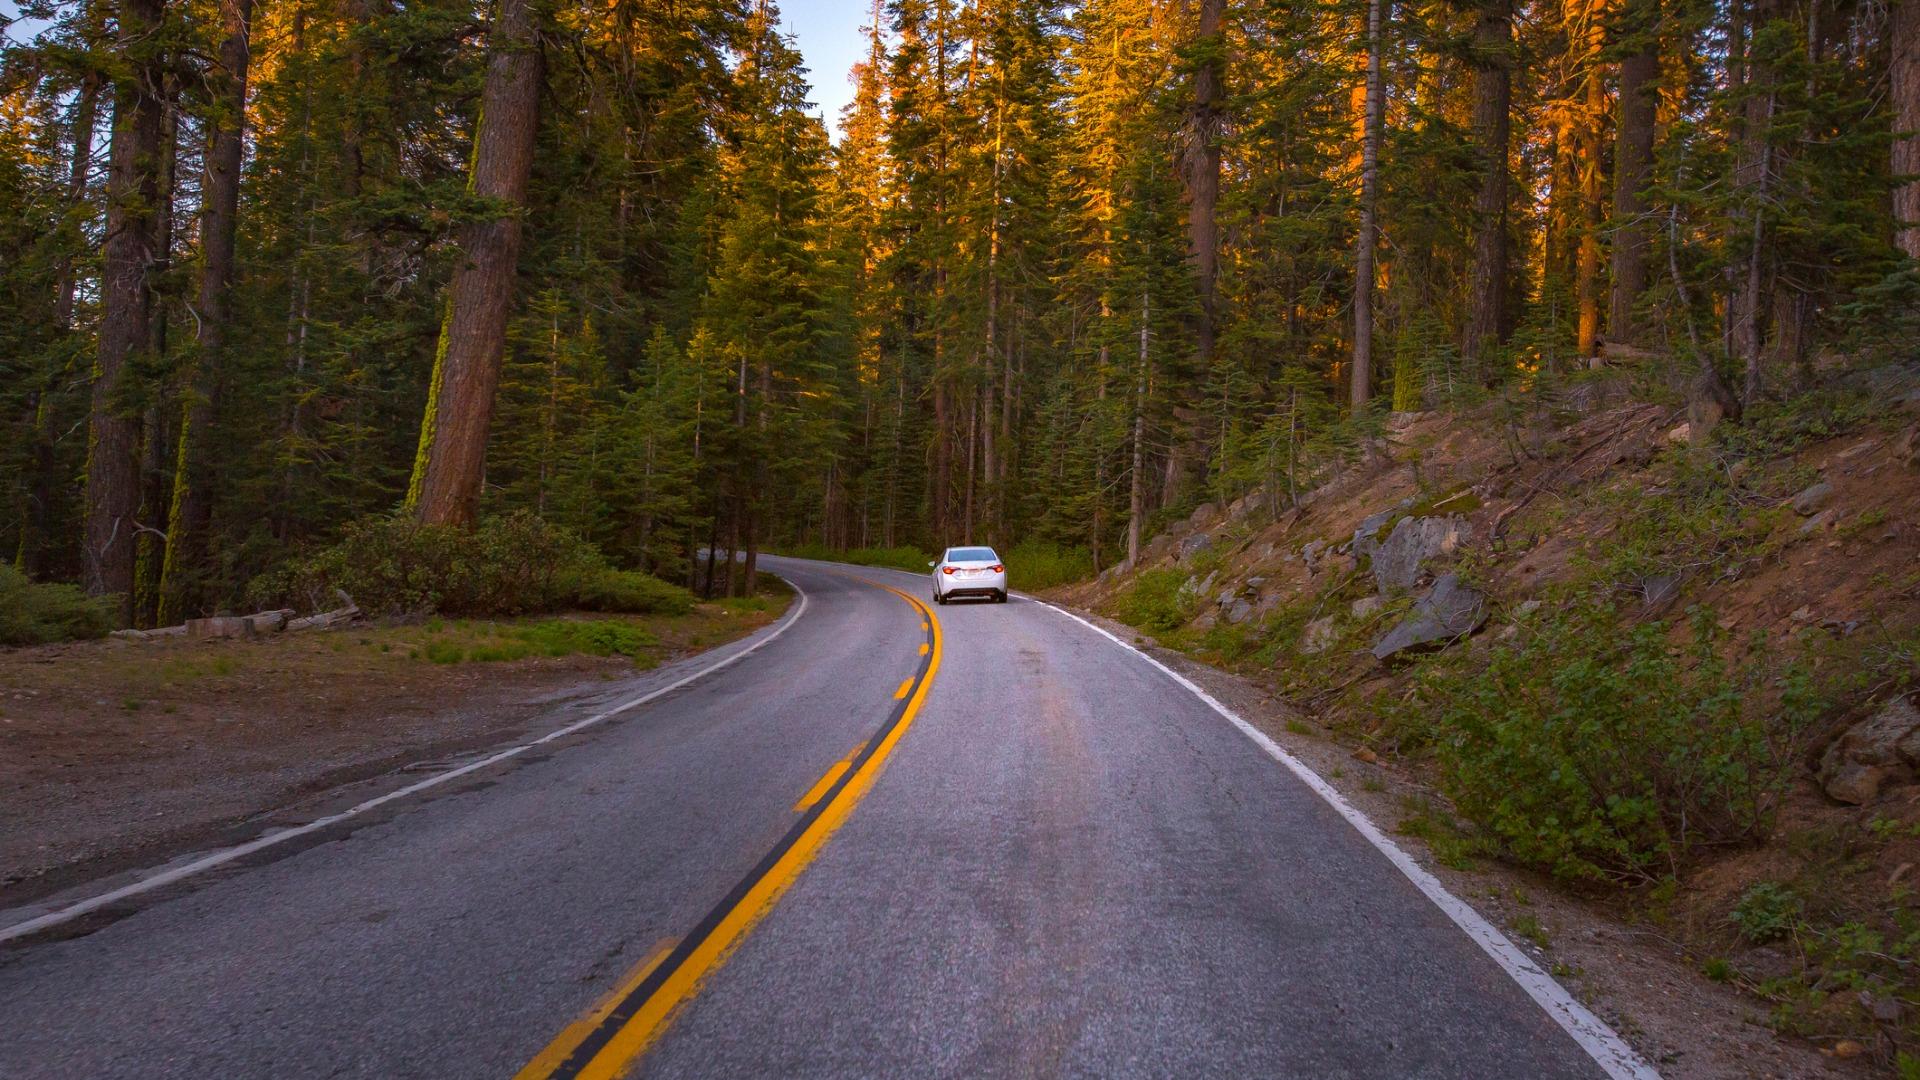 Road Trip: Discovering California